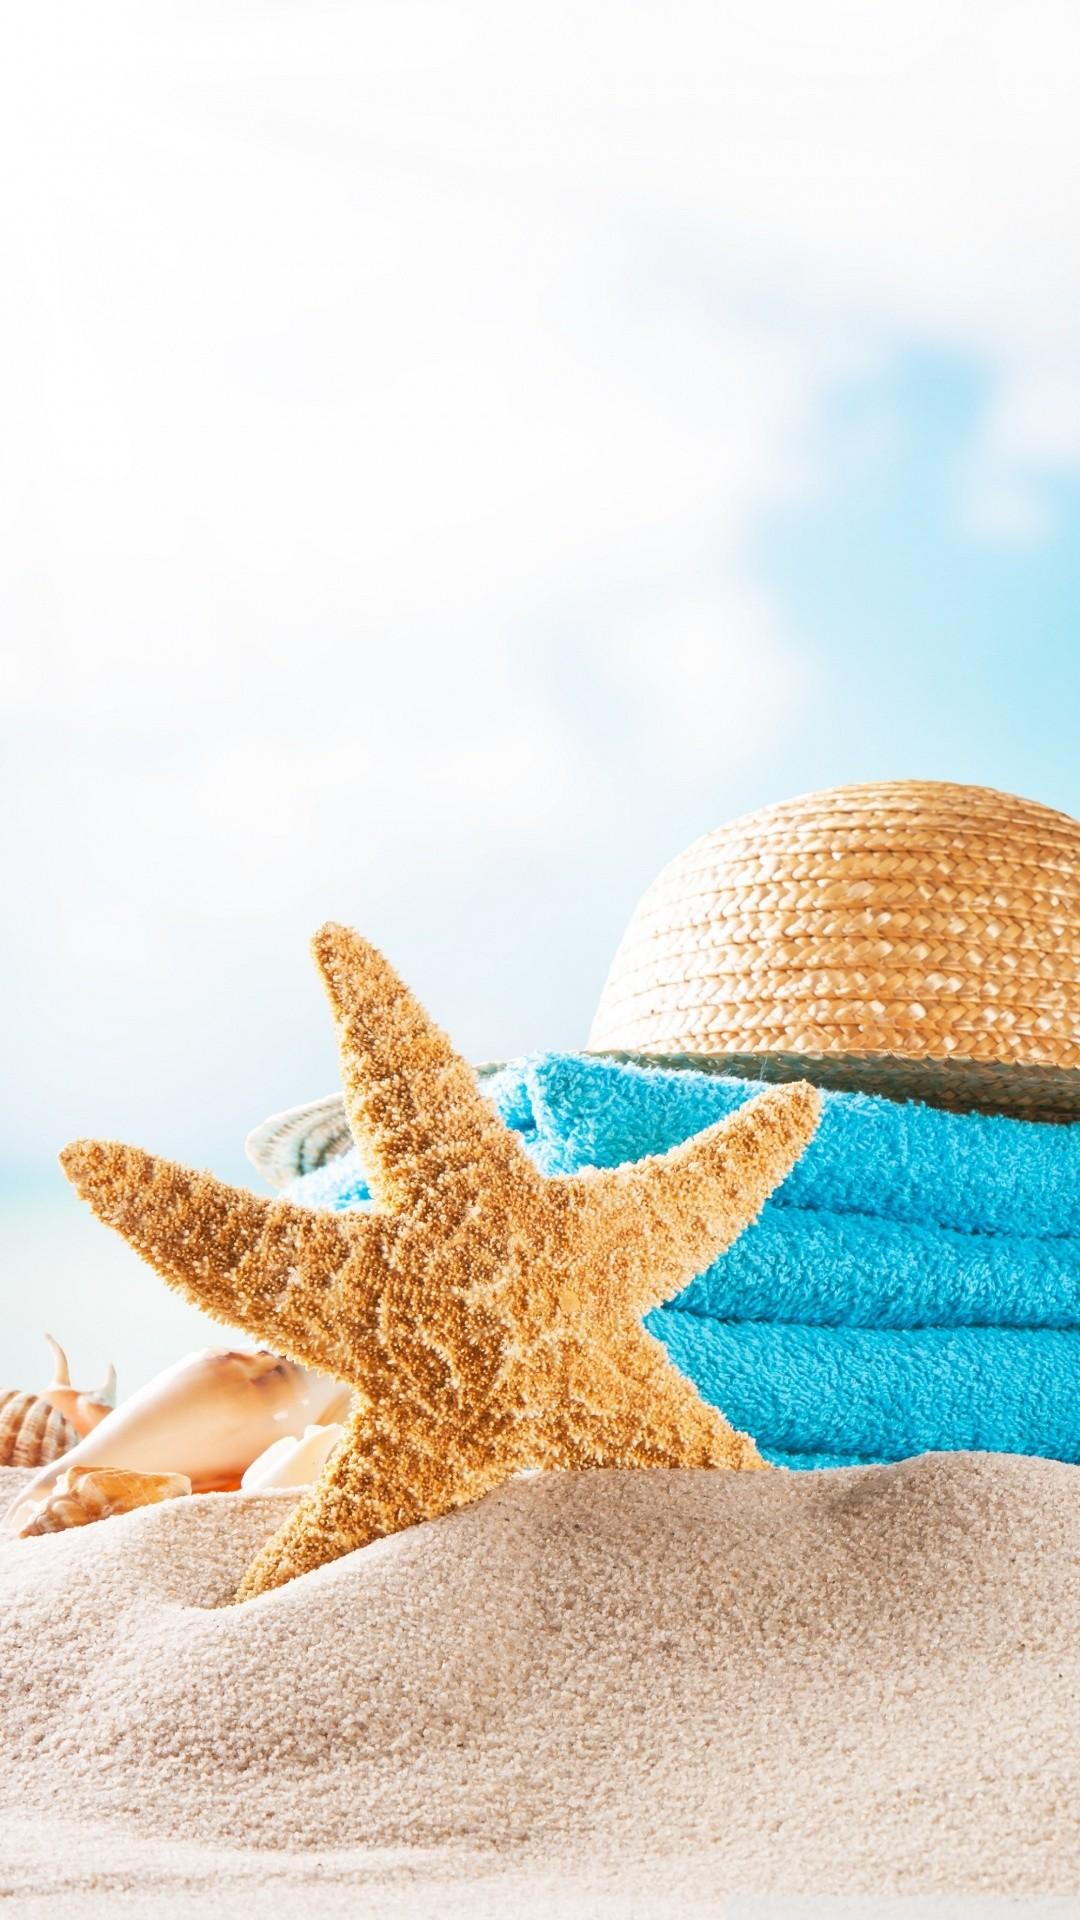 Free Summer Beach phone wallpaper by raverxx